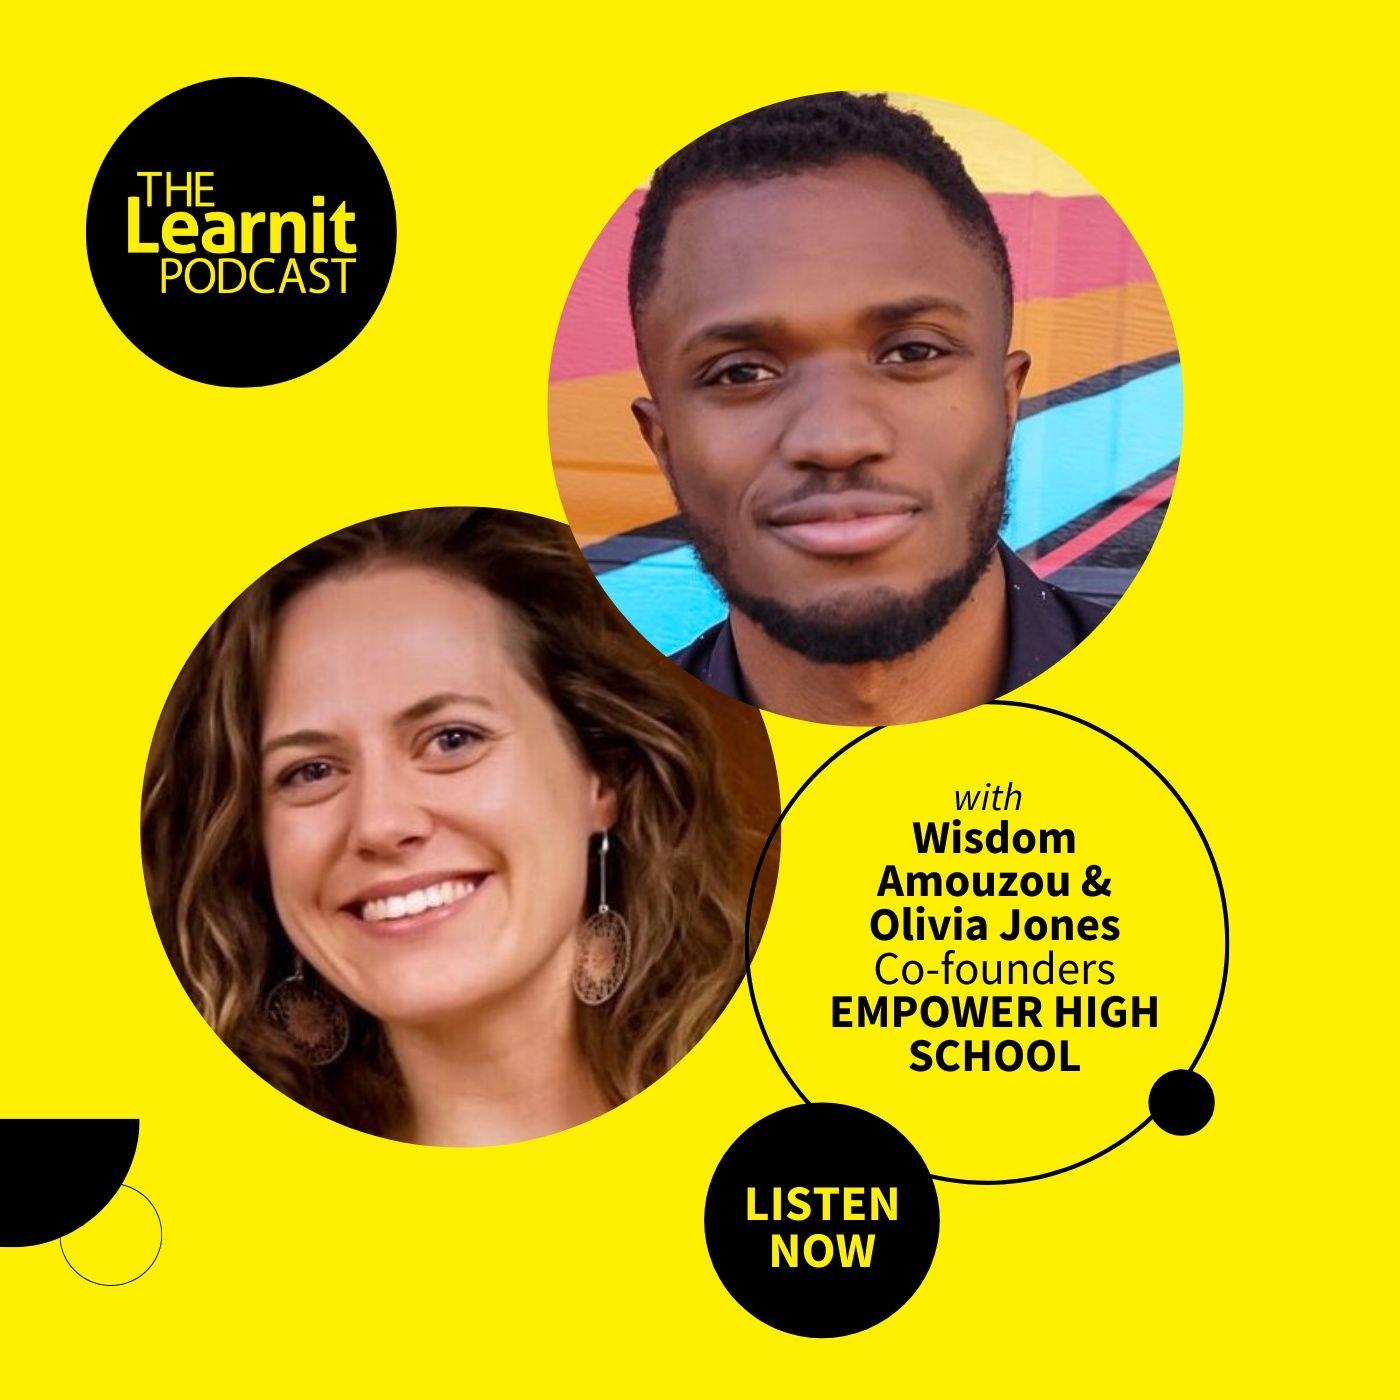 #14 Wisdom Amouzou & Olivia Jones, Empower High School: What Happens in a Student-led School?